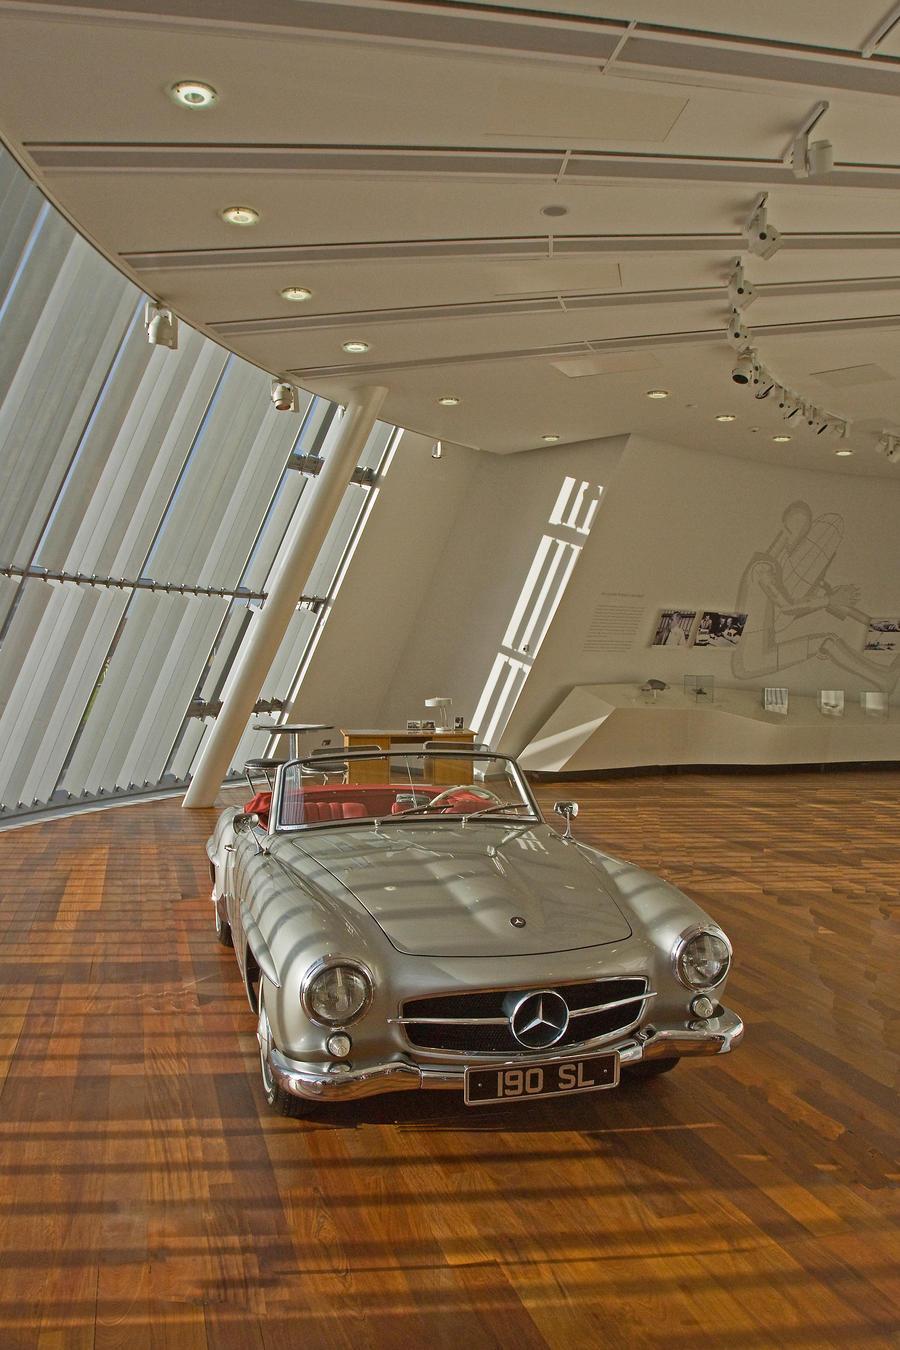 M. Burroughs's Rusty BMW.